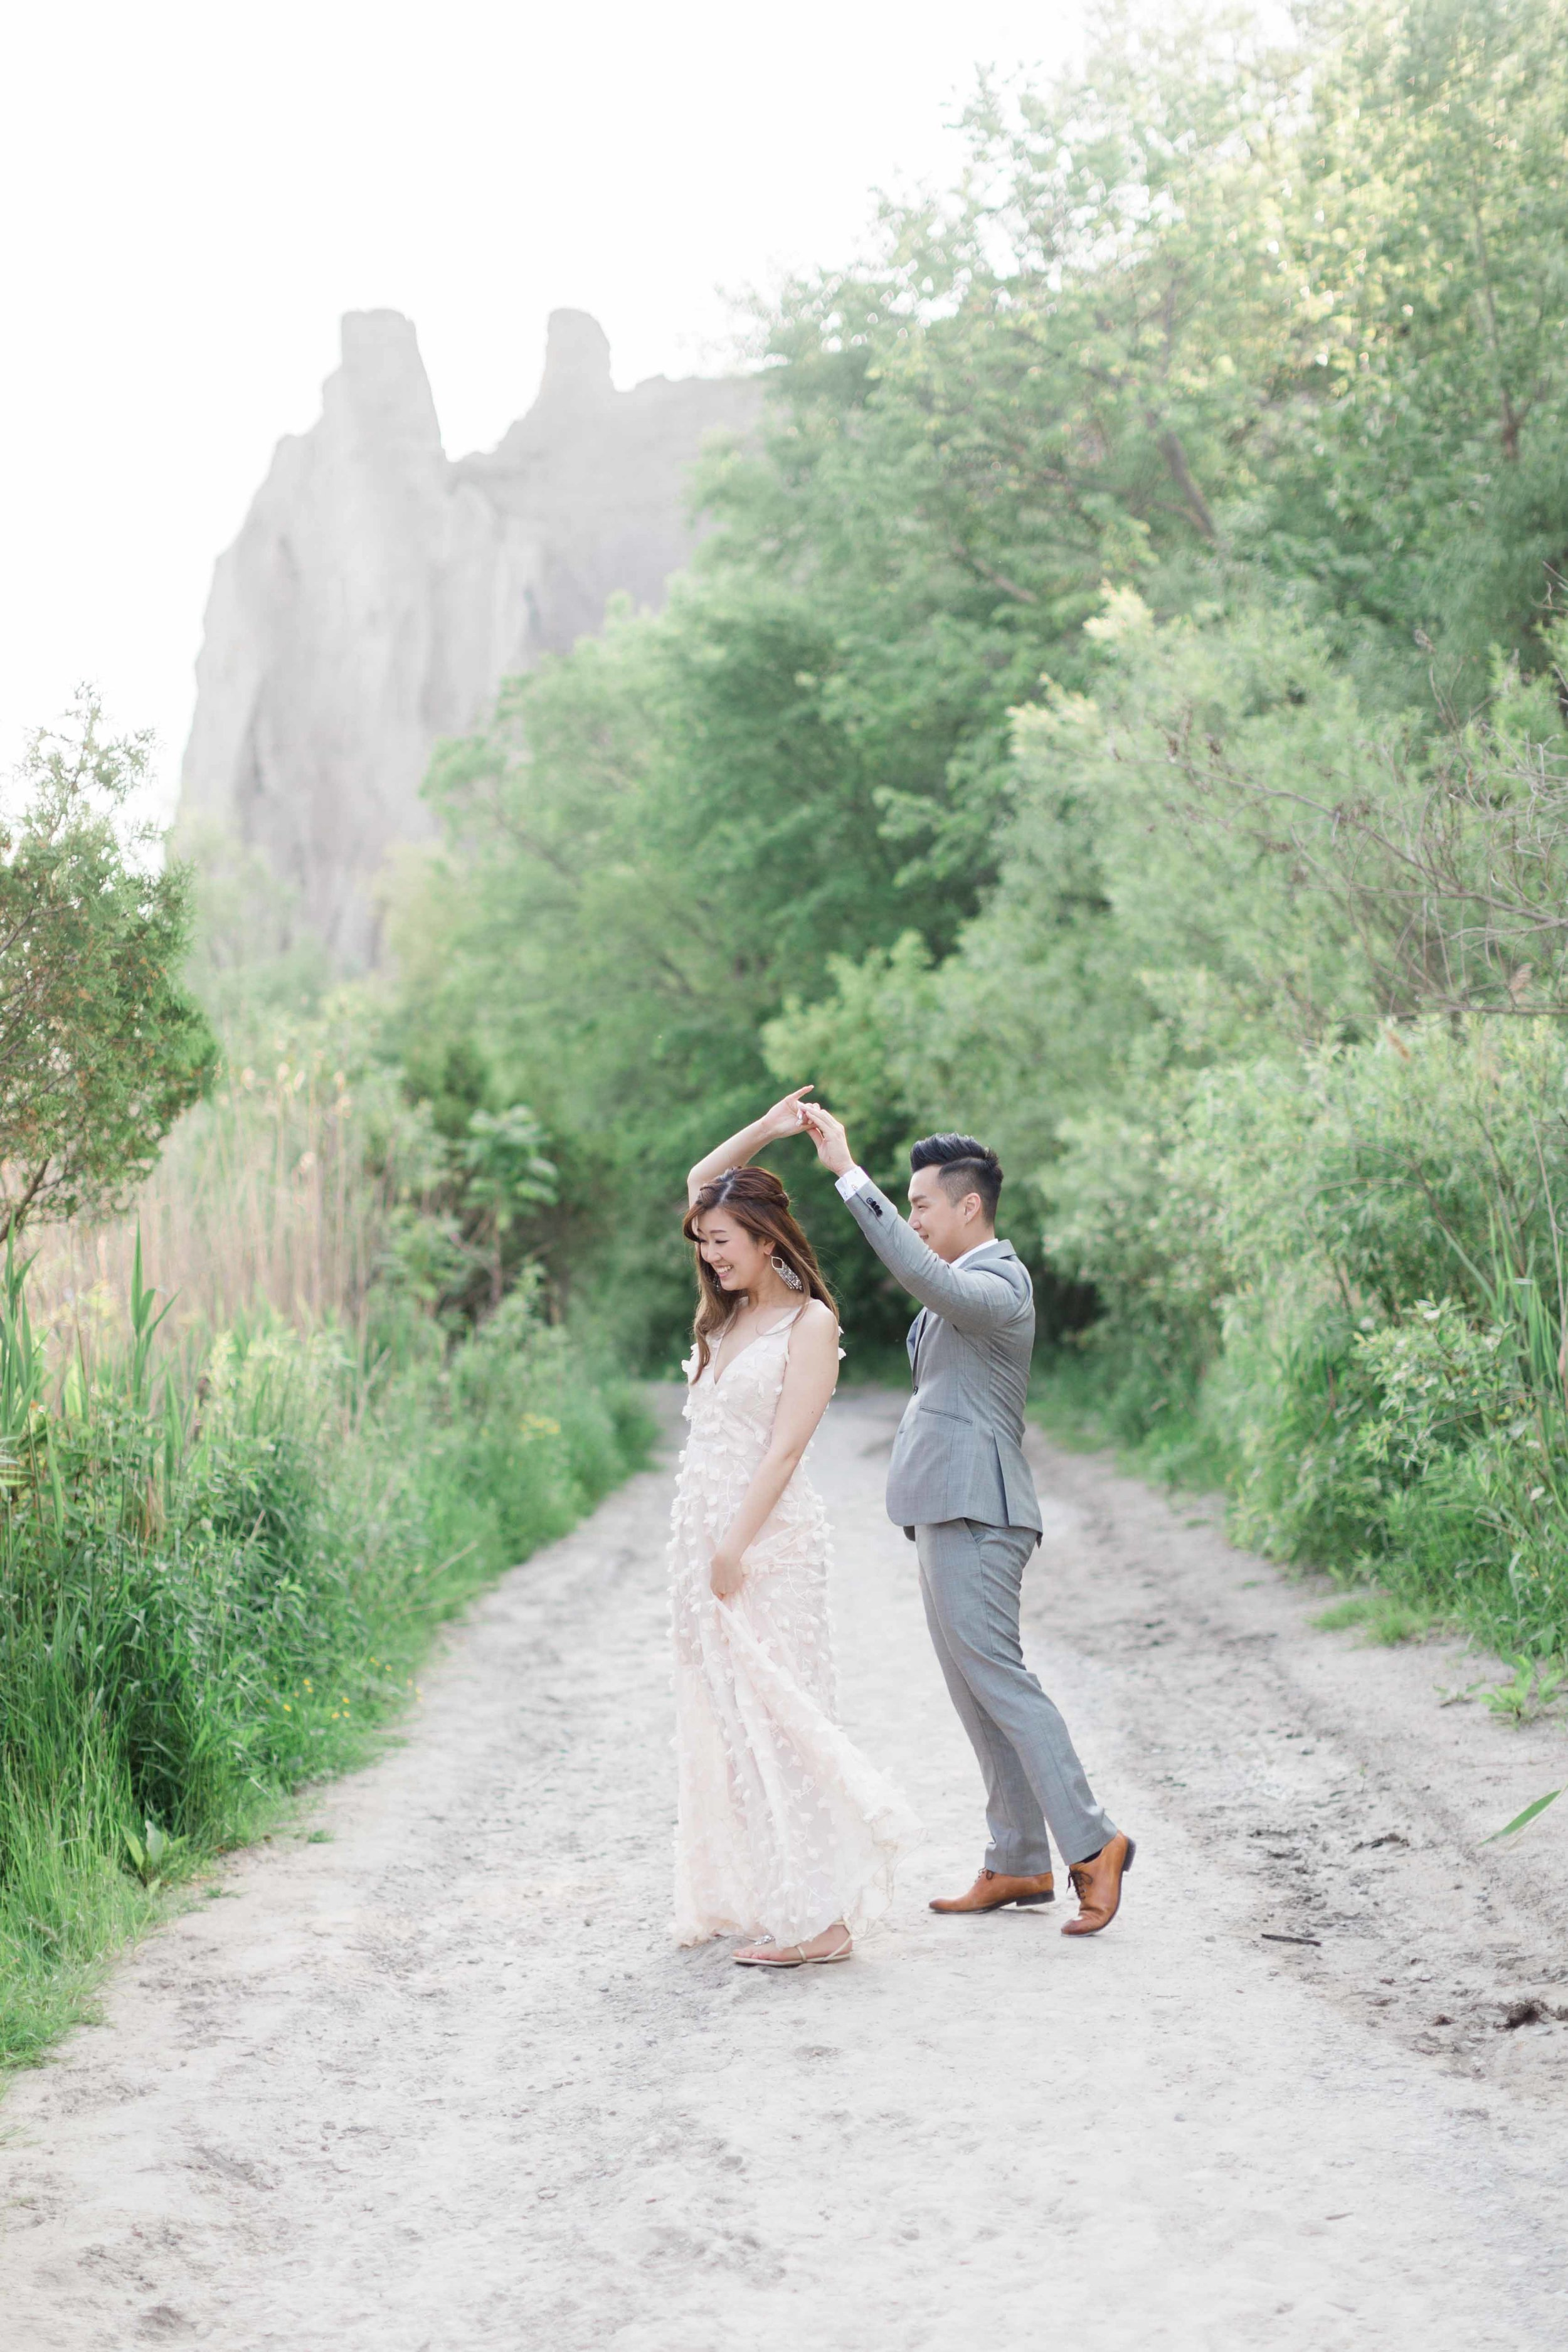 Cari Zhu Fine Art Photographer - Scarborough Bluffs Engagement Session-5.jpg